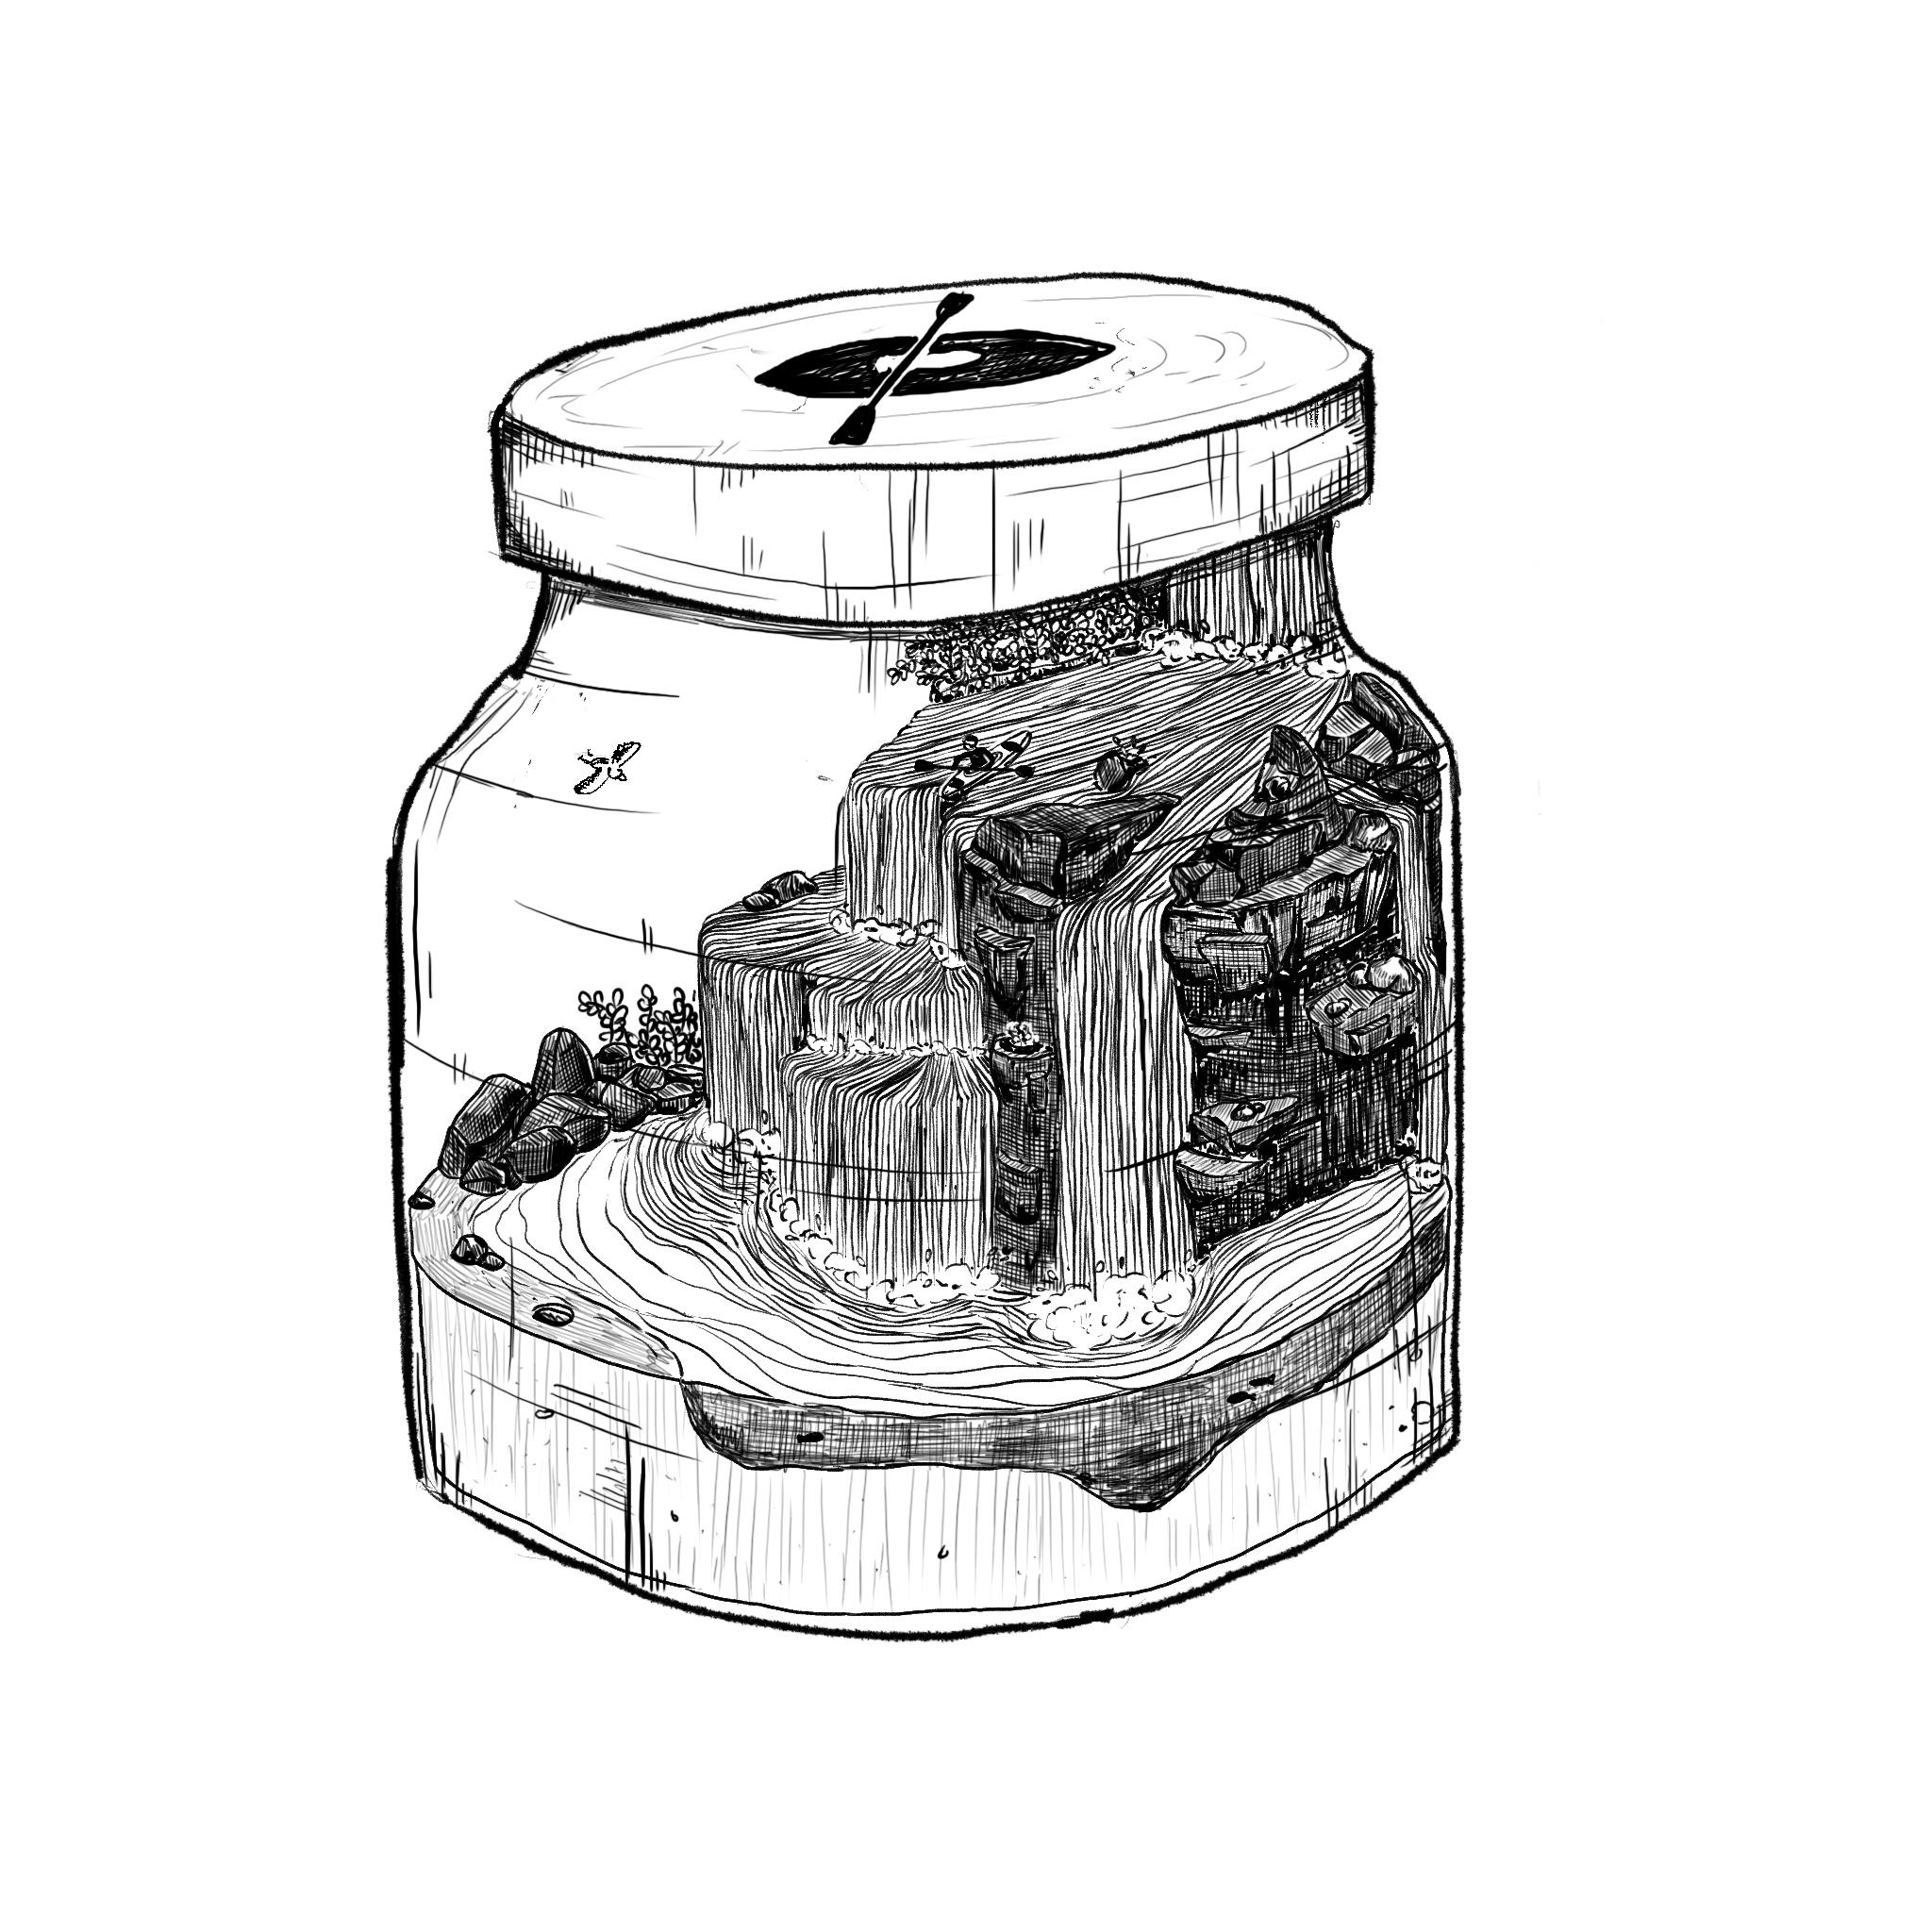 Salome Iljana: Illustration